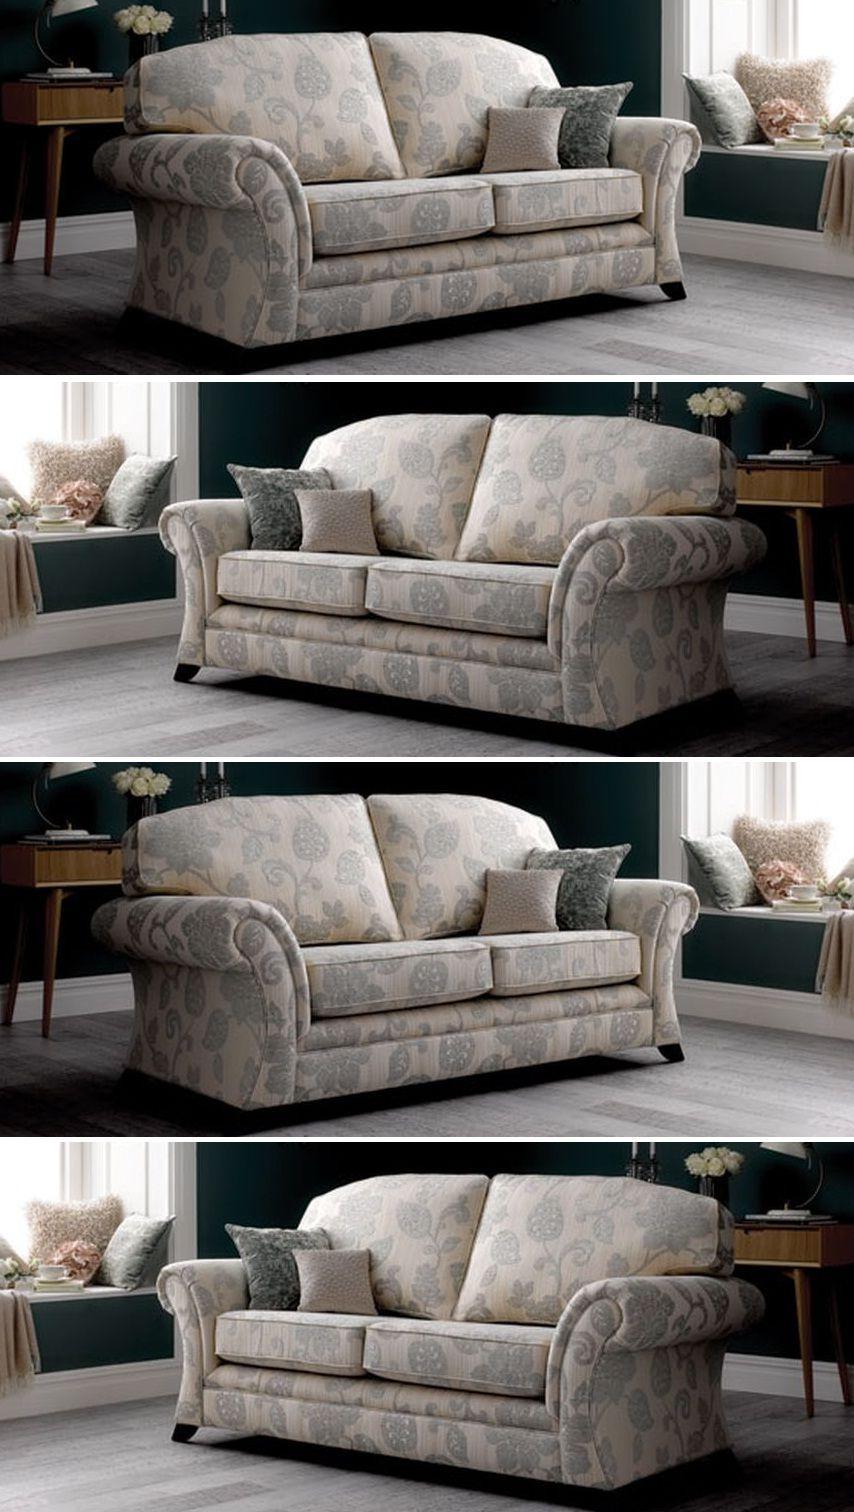 Floral Print Fabric Sofas Latest Sofa Designs Sofa Set Designs Printed Fabric Sofa